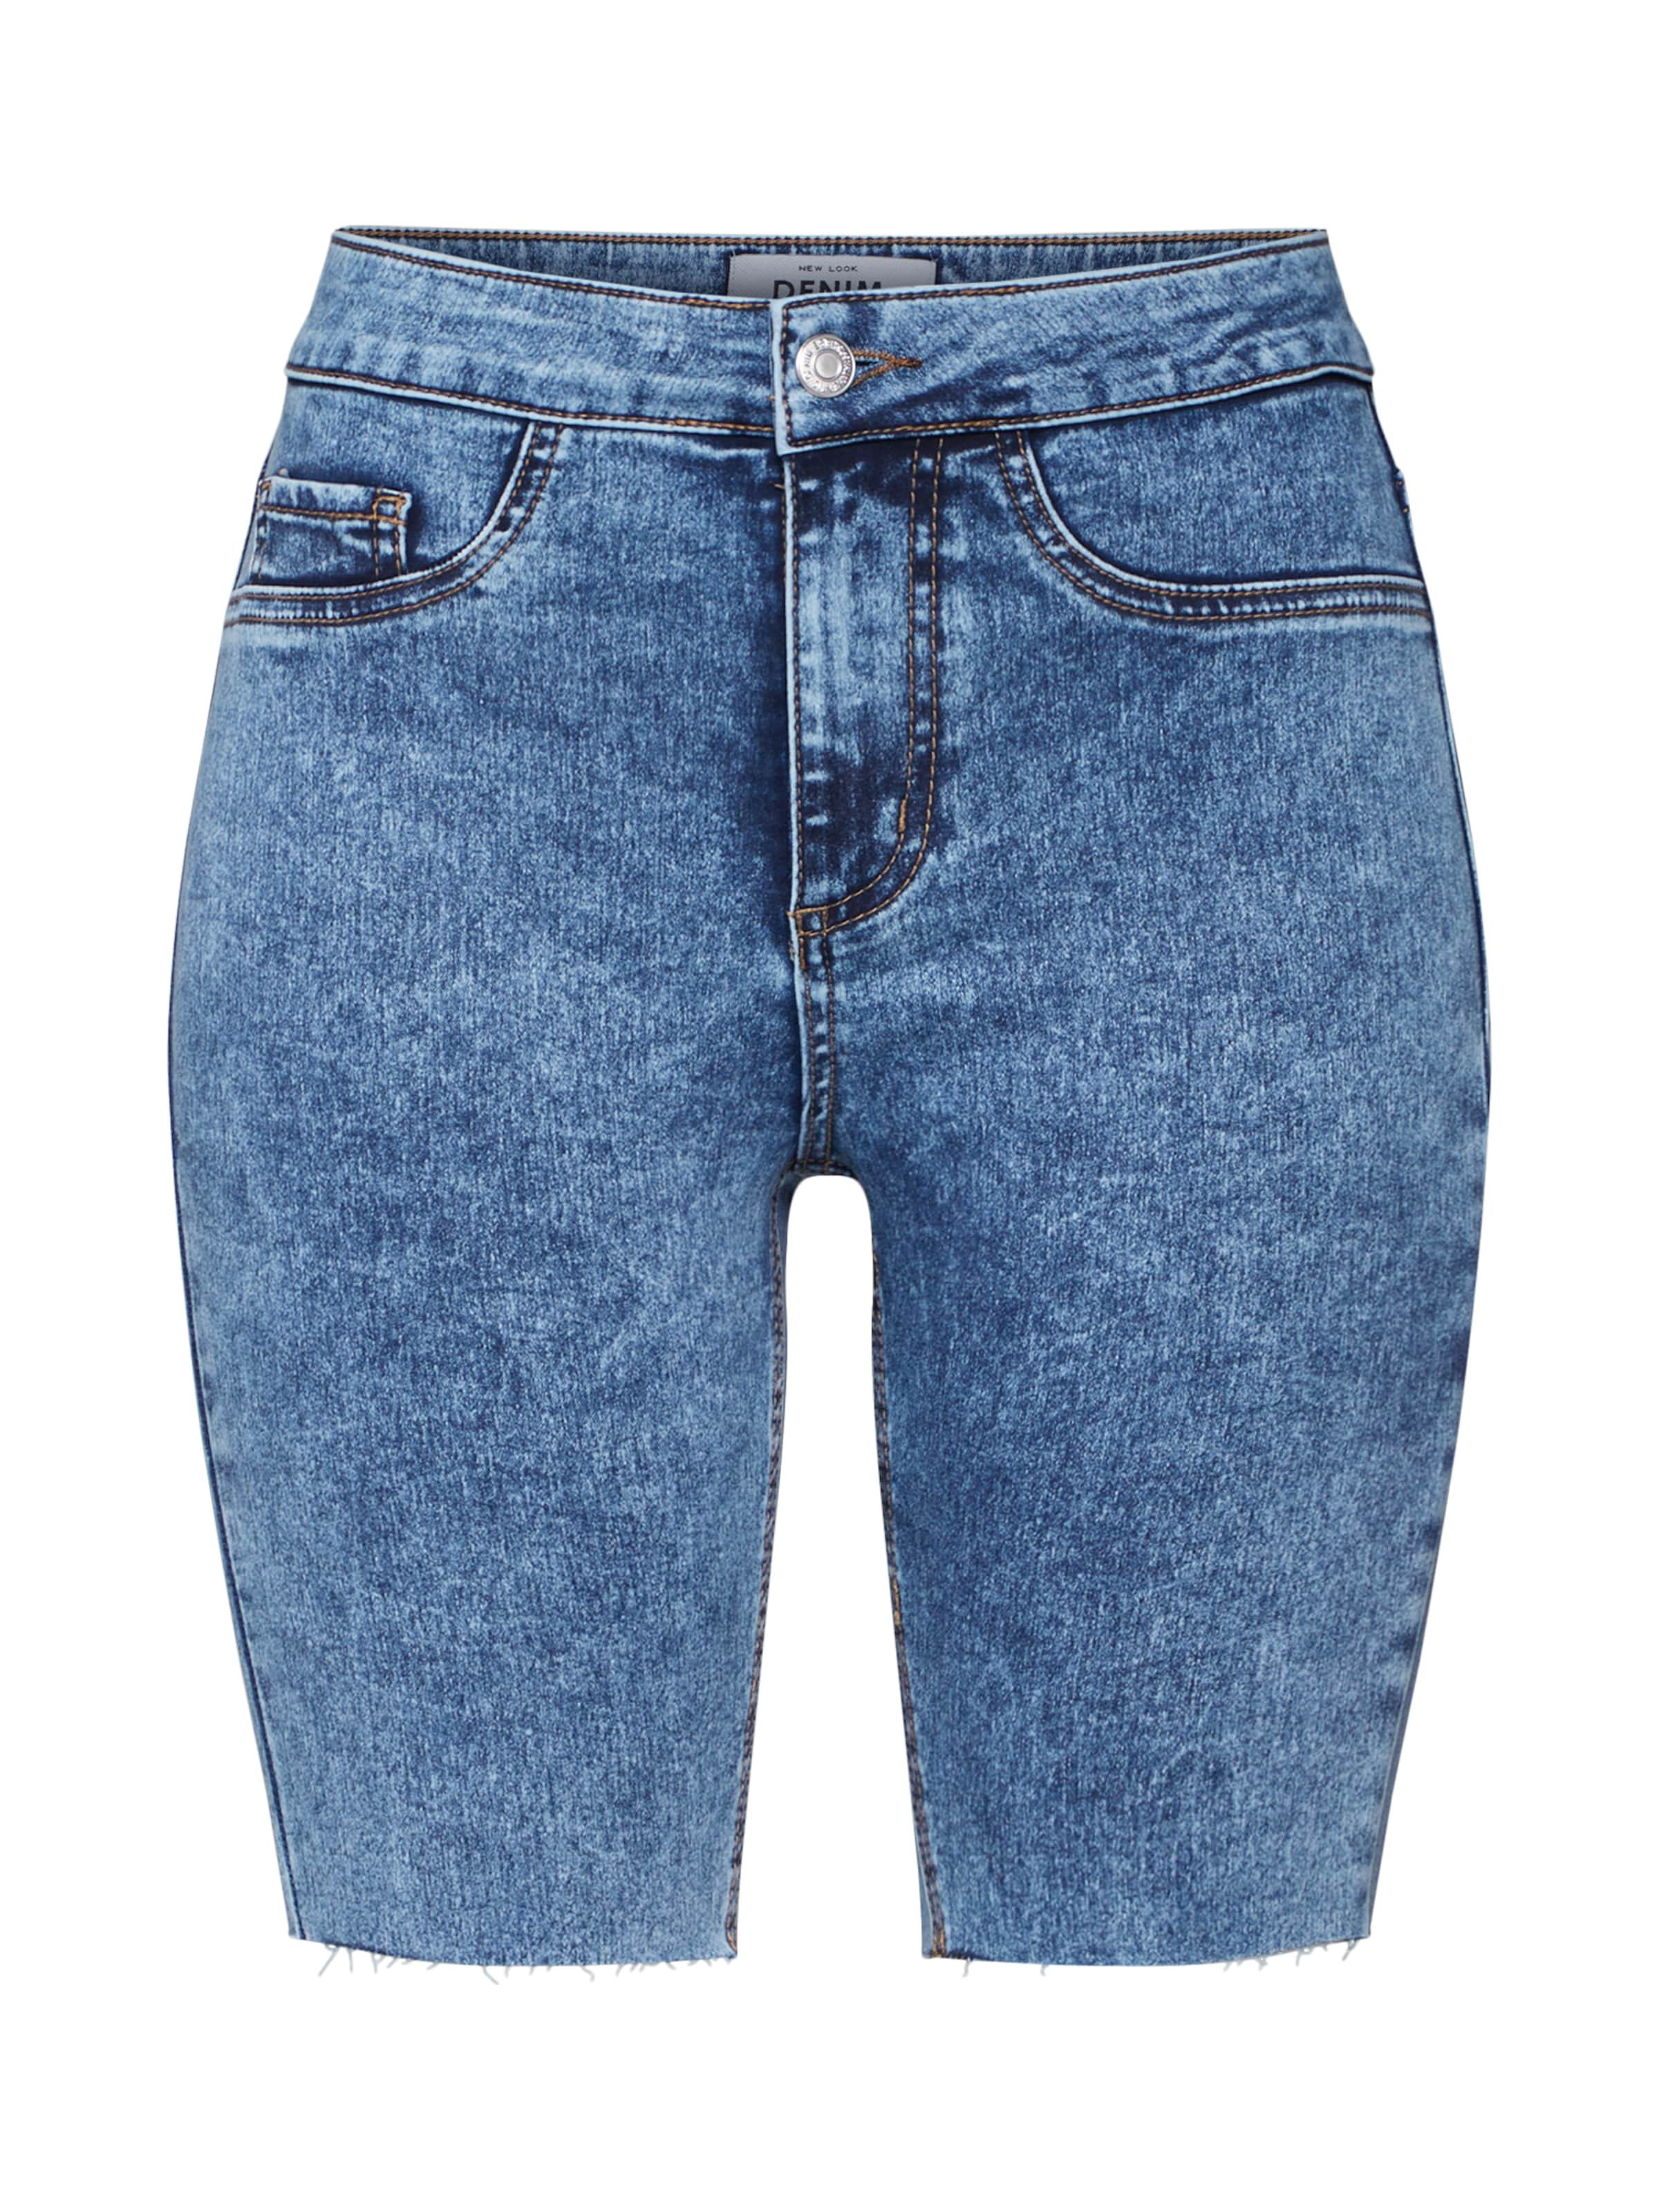 In Look 'acid Jeans Himmelblau New Stormzy' 3ARLcqj54